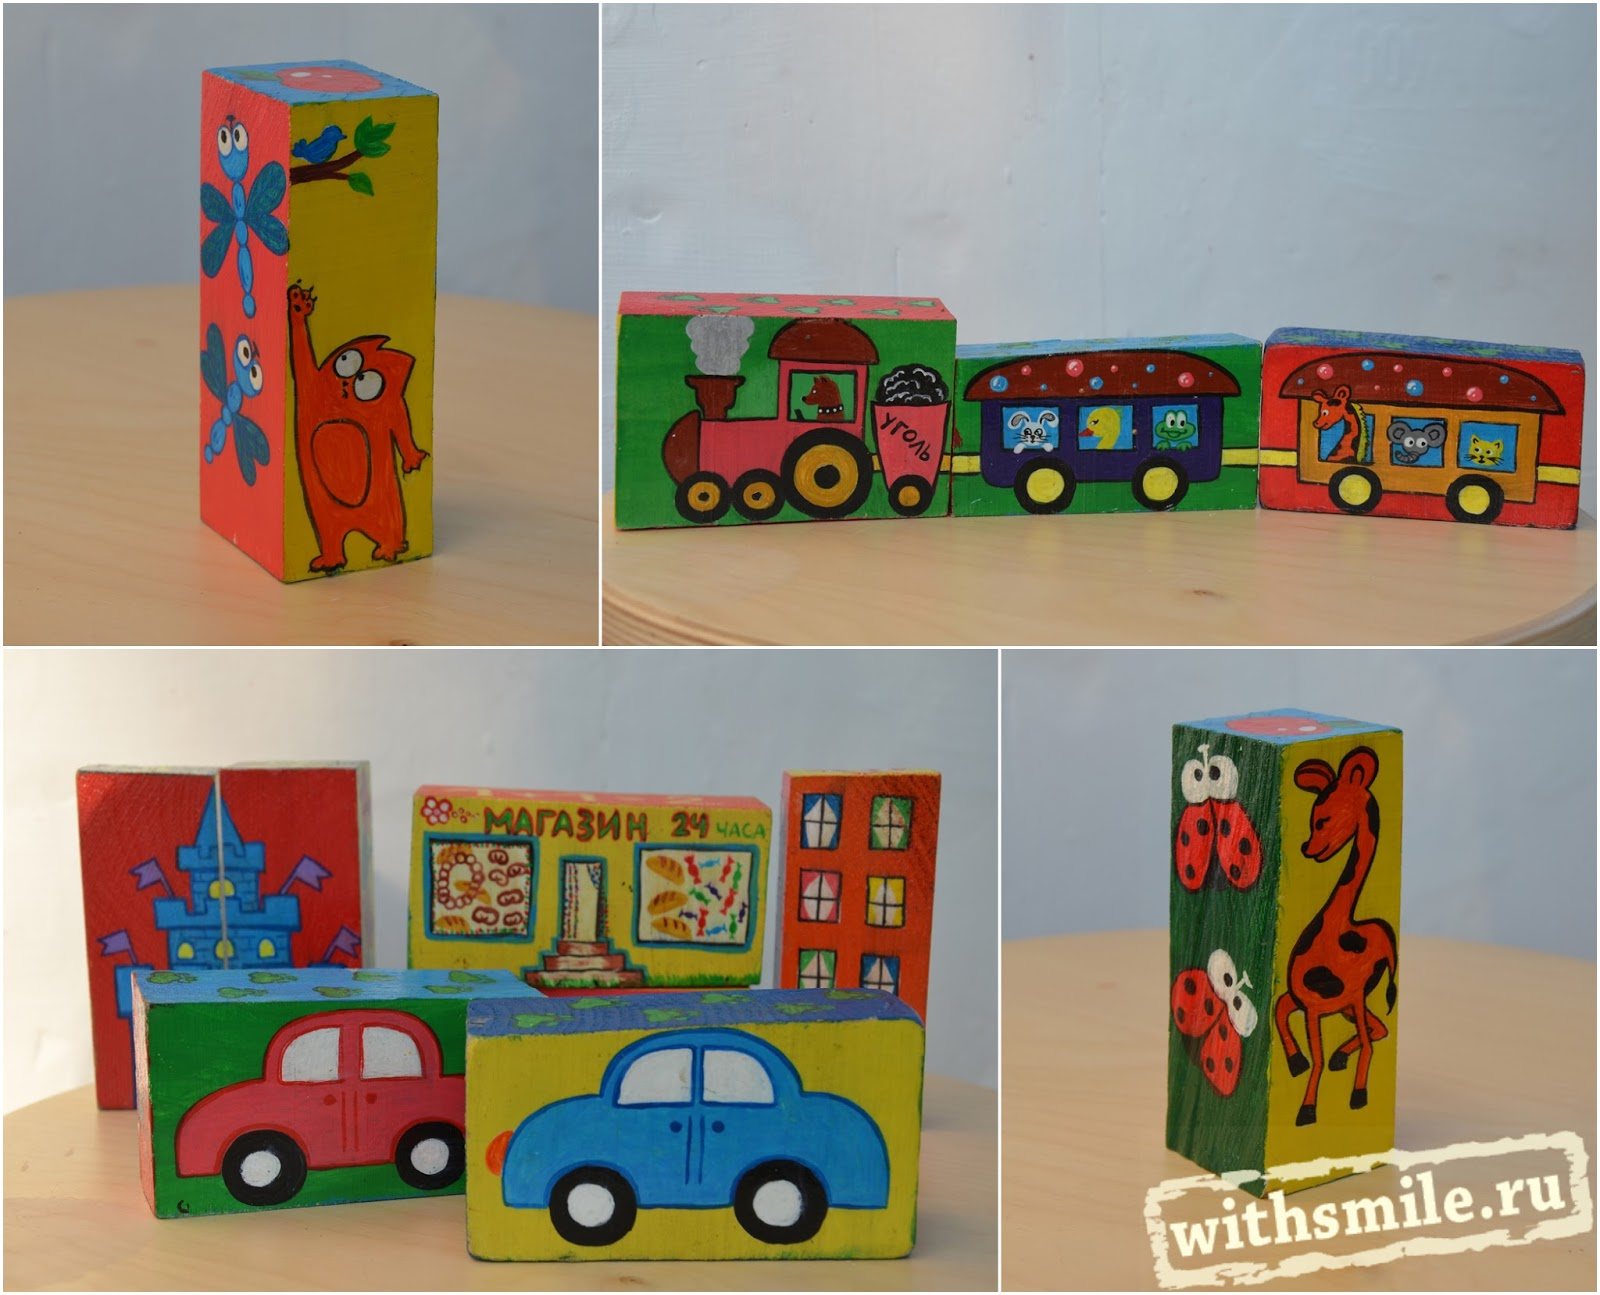 кот Саймон, паровозик, машинки, детские игрушки, игрушки из дерева, игрушки своими руками